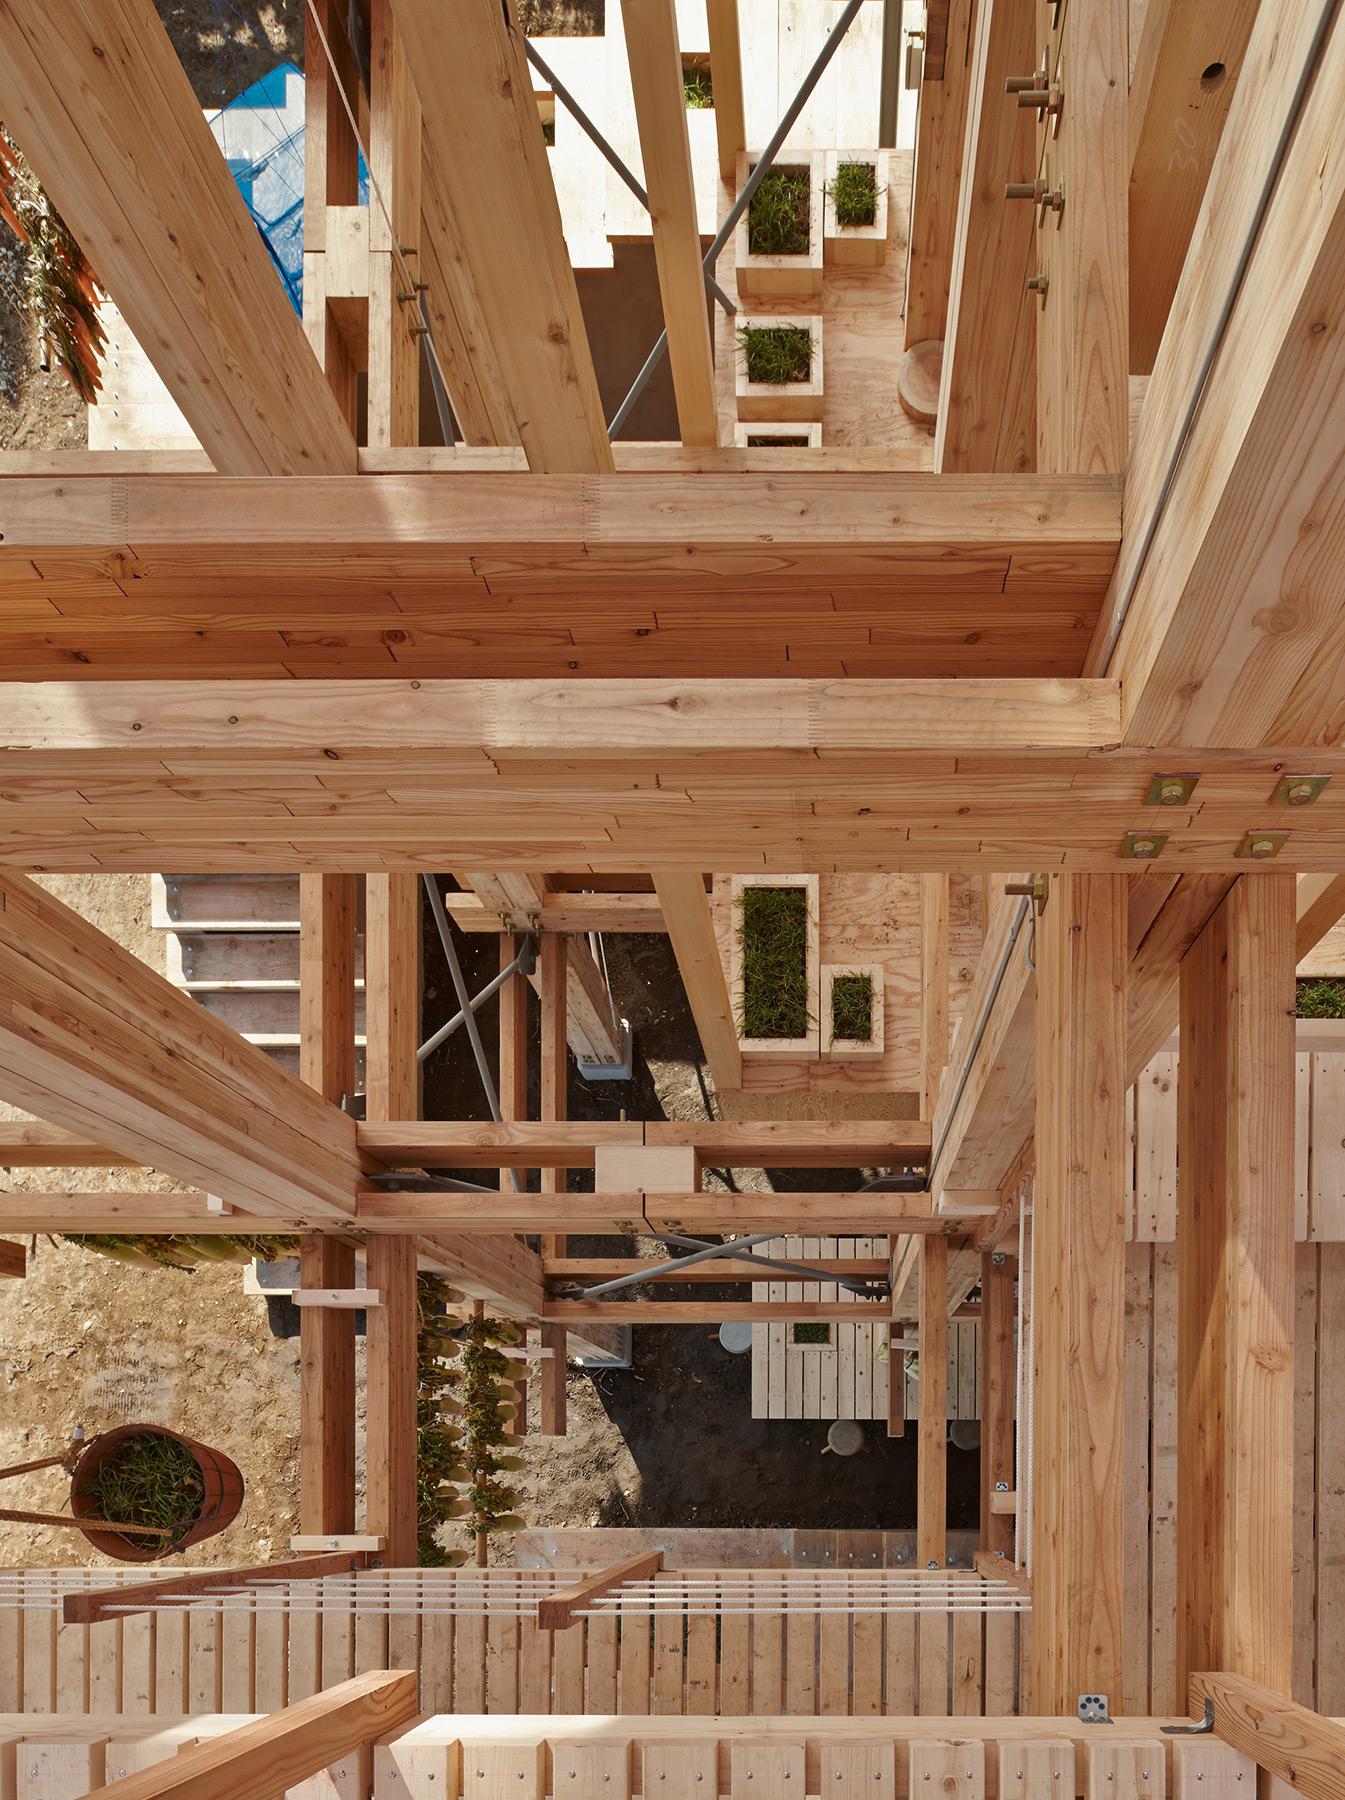 Nest We Grow / College of Environmental Design & Kengo Kuma & Associates (31)